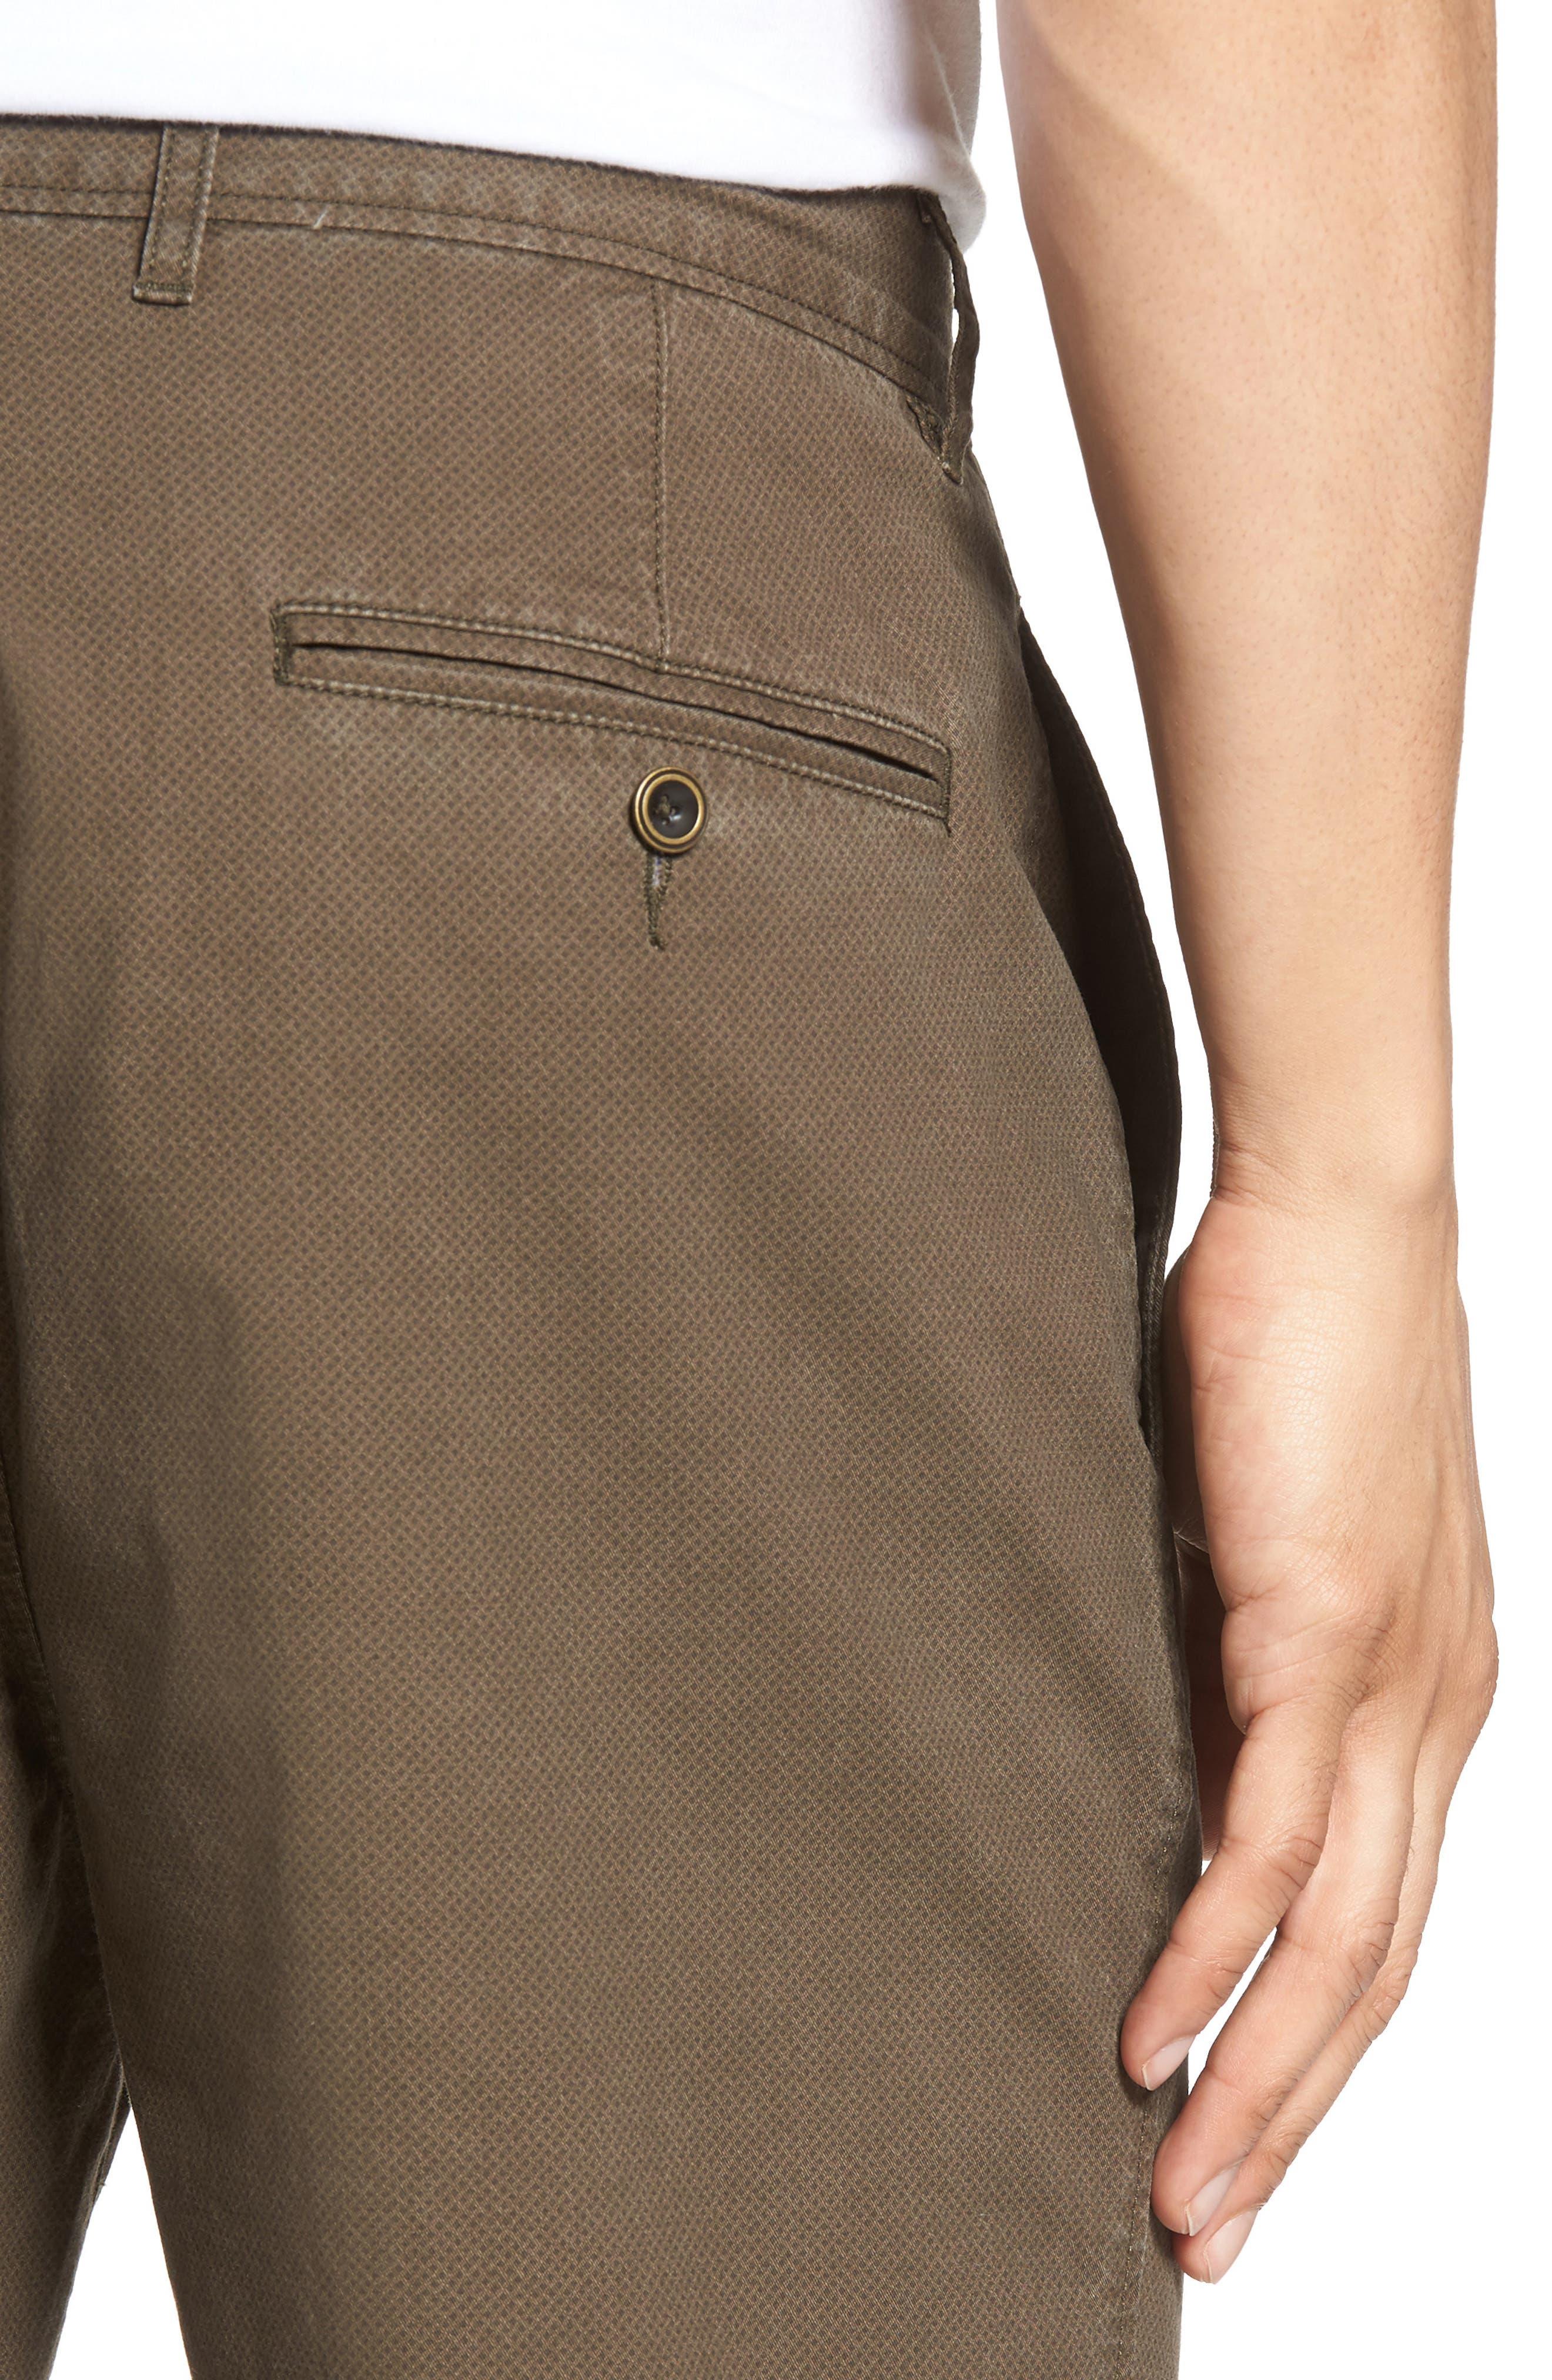 Benneydale Shorts,                             Alternate thumbnail 4, color,                             Olive